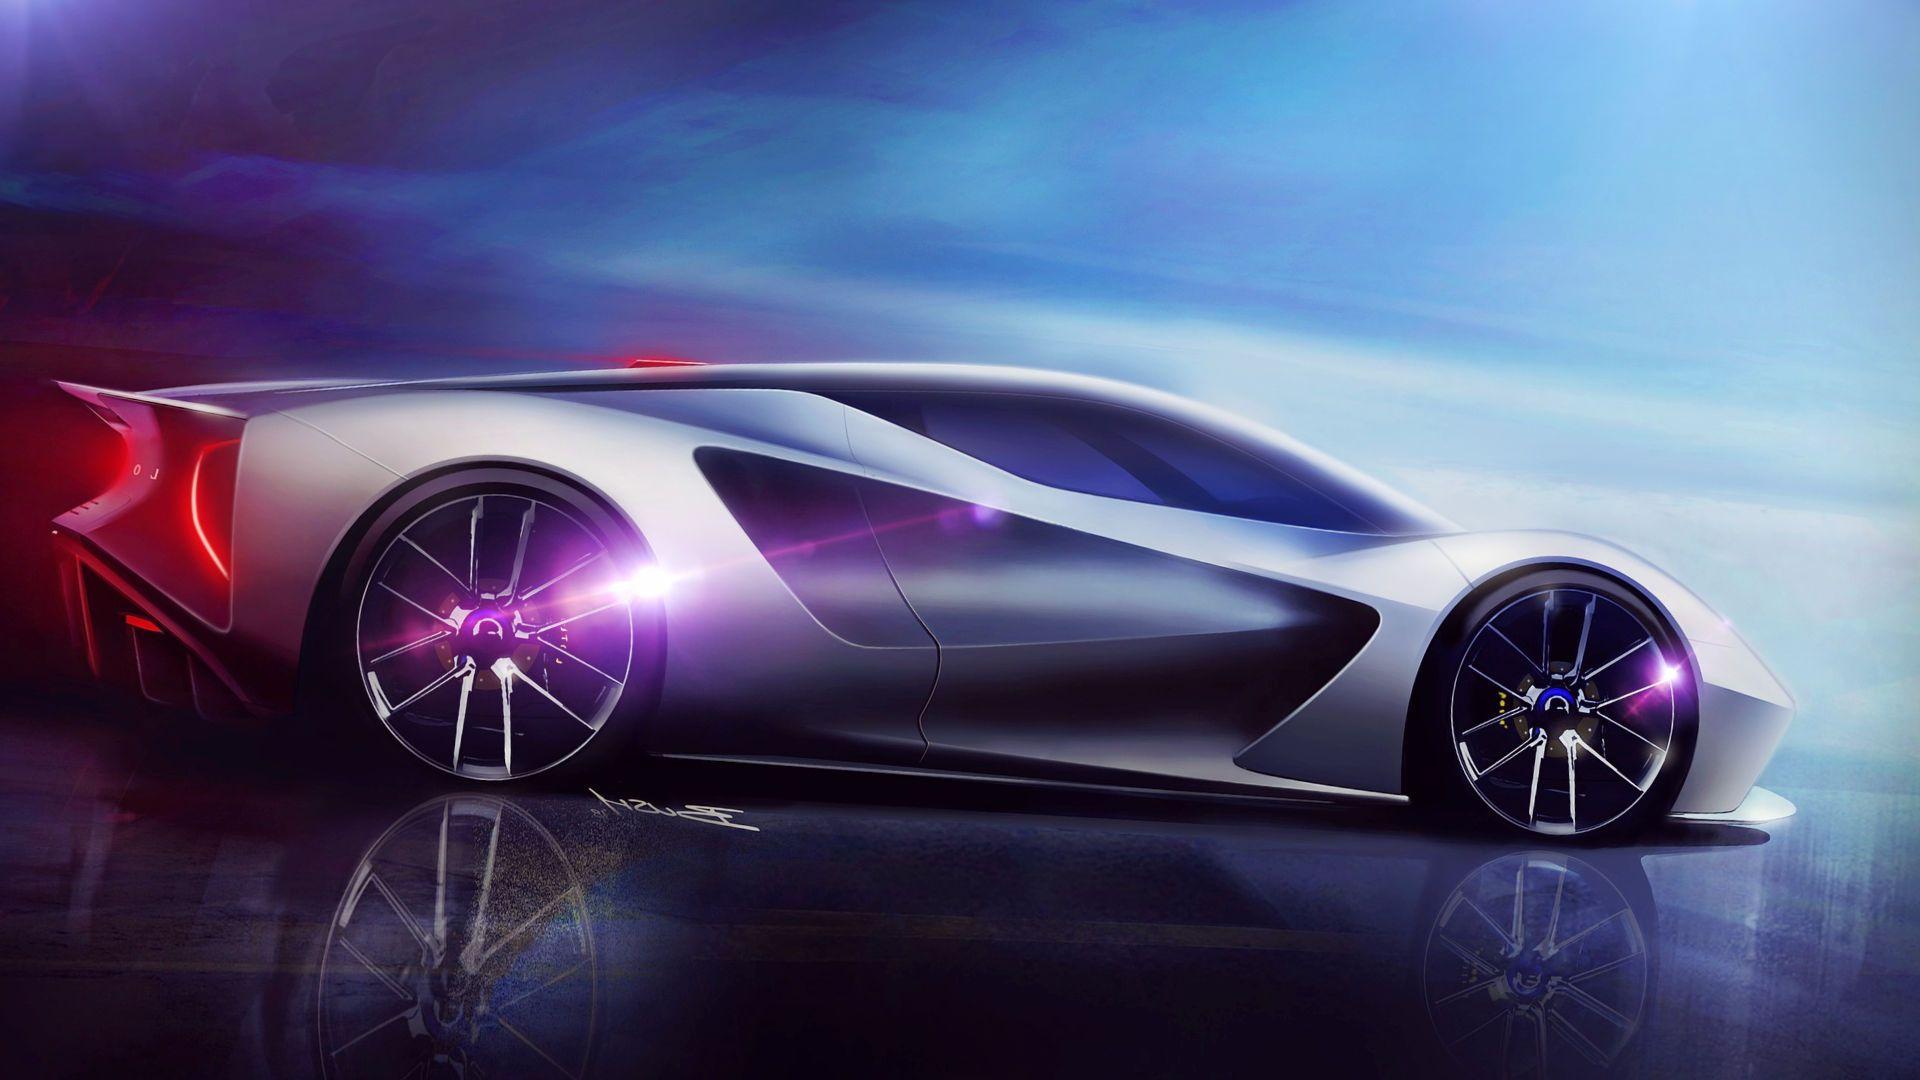 Lotus Evija Hypercar 2020 Wallpaper